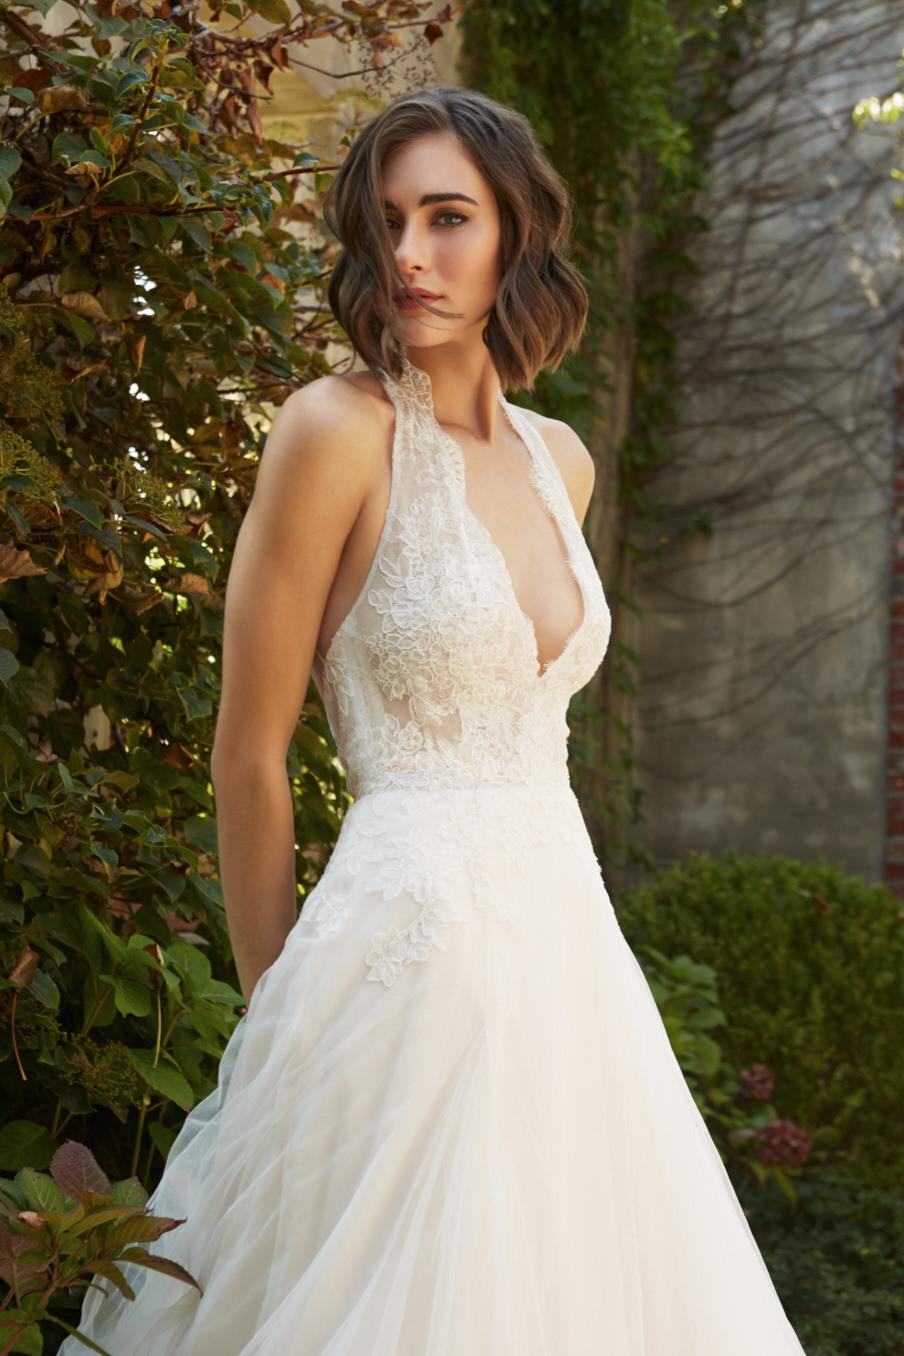 94109a538 Female fashion model wears Azalea a romantic white wedding dress of lace  and chiffon with a sexy ...